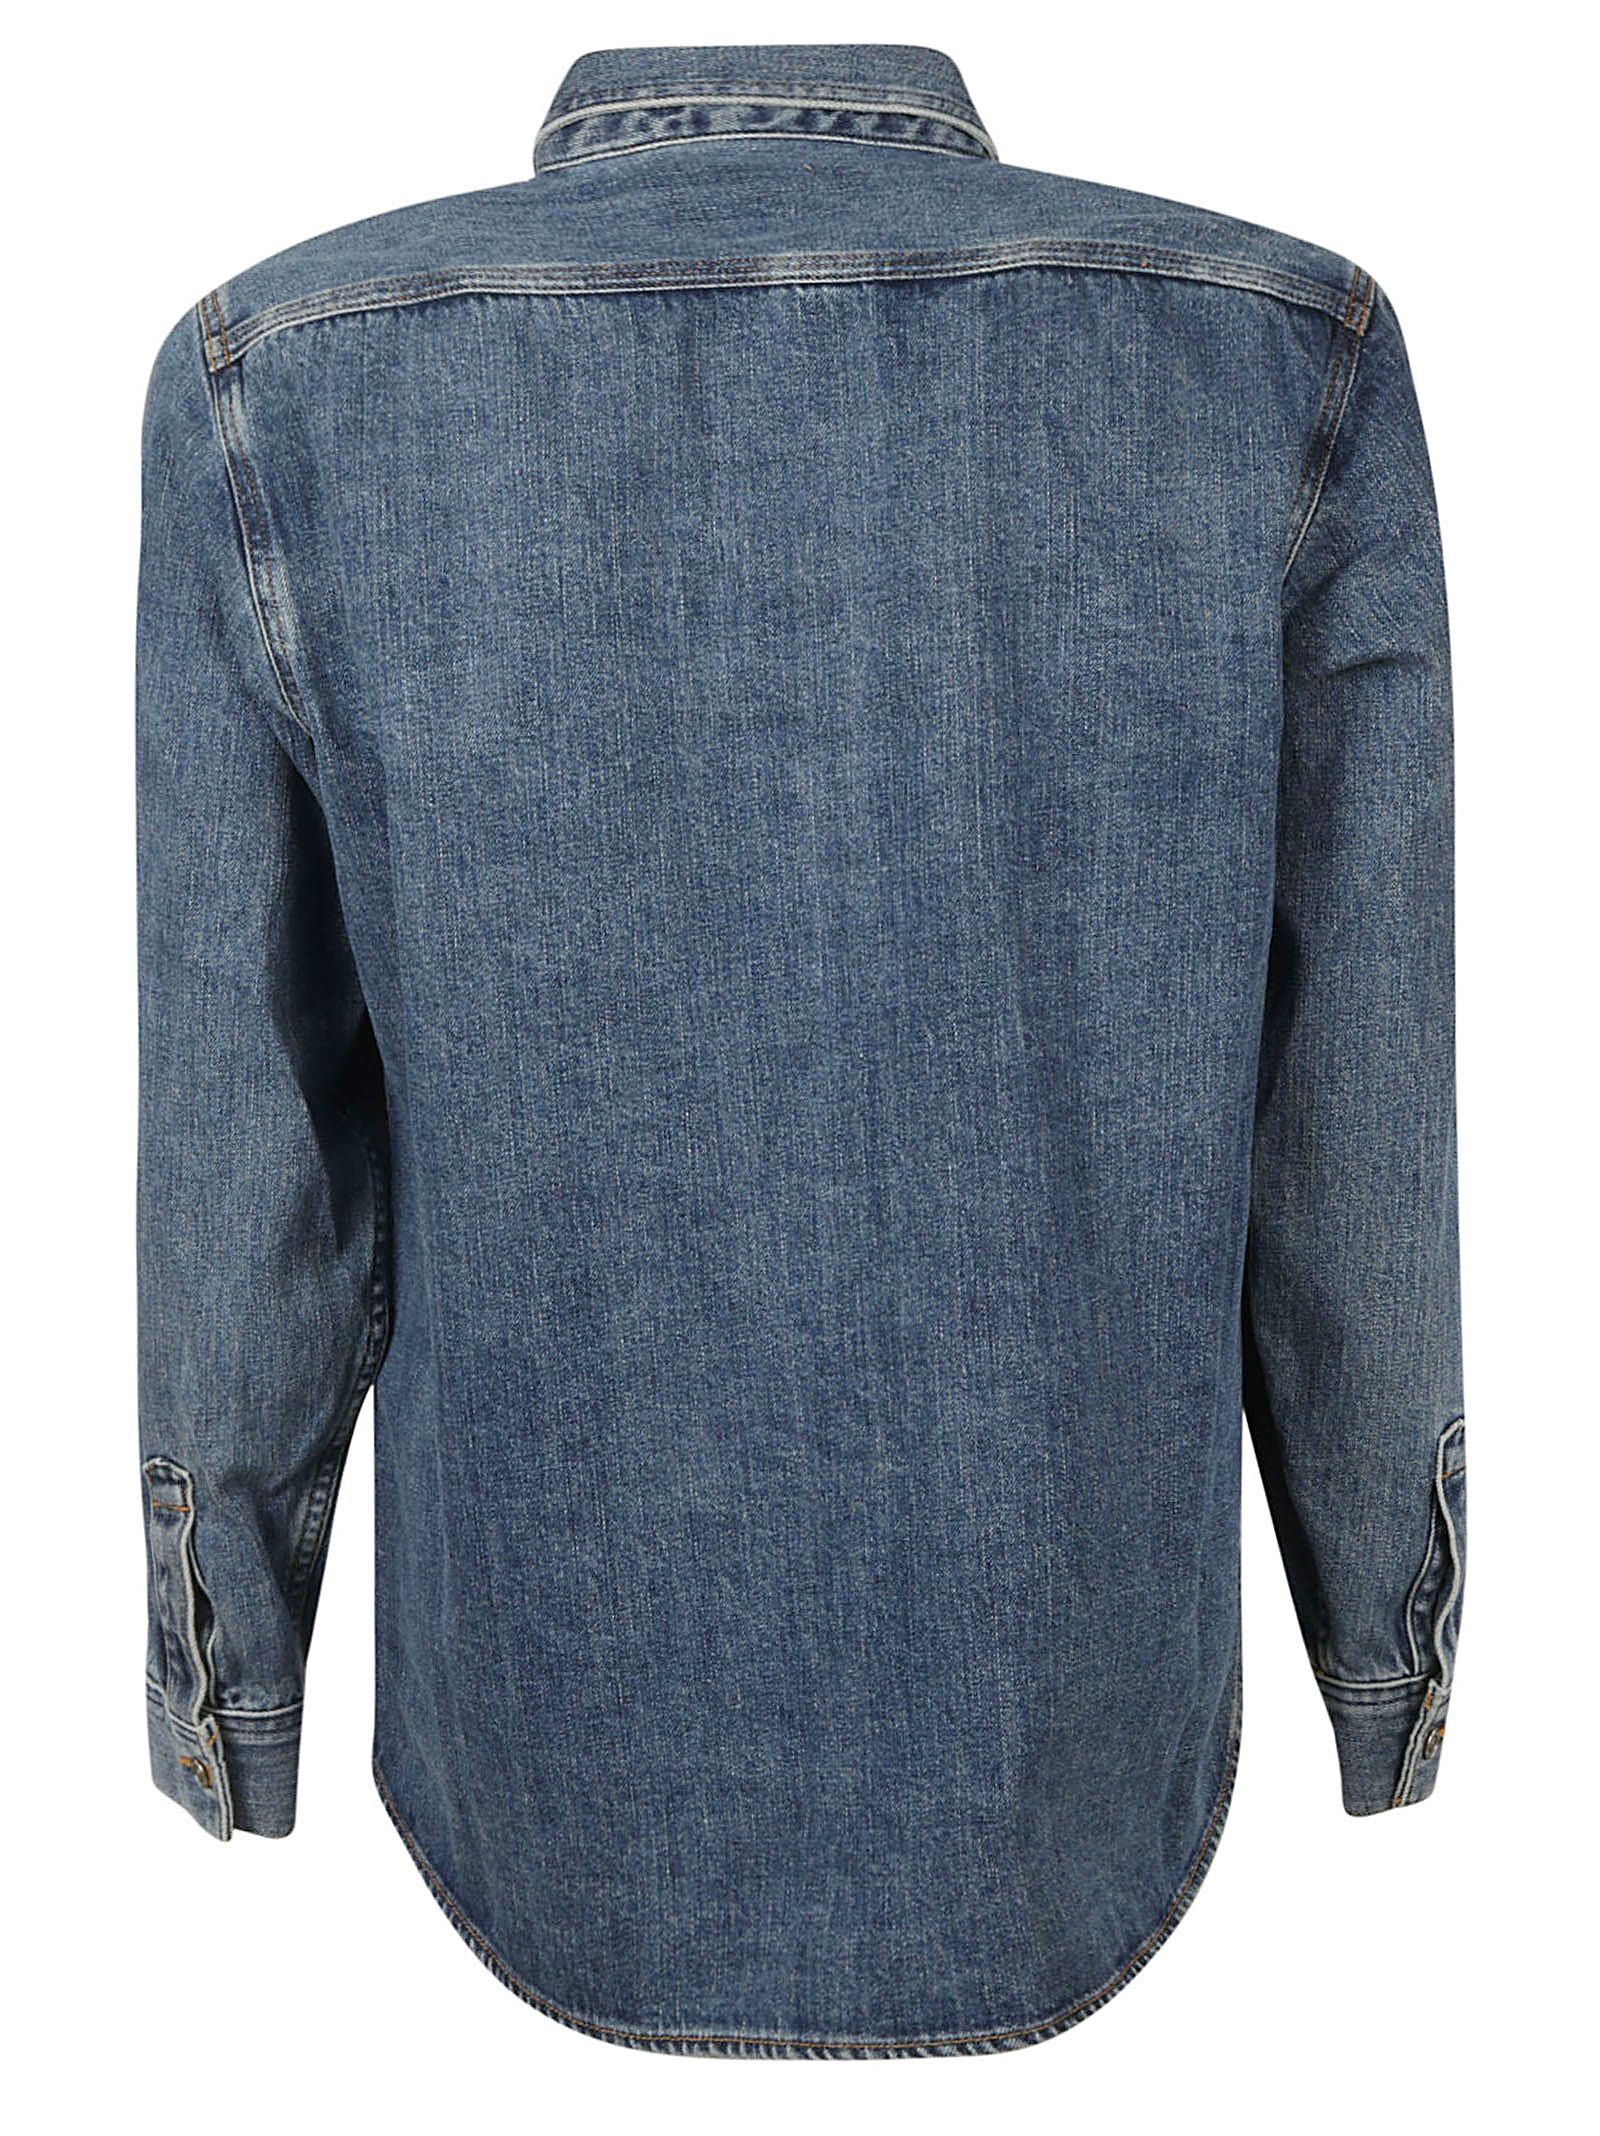 a4cd796abb Burberry Burberry Crest Print Denim Shirt - Blue - 10811794